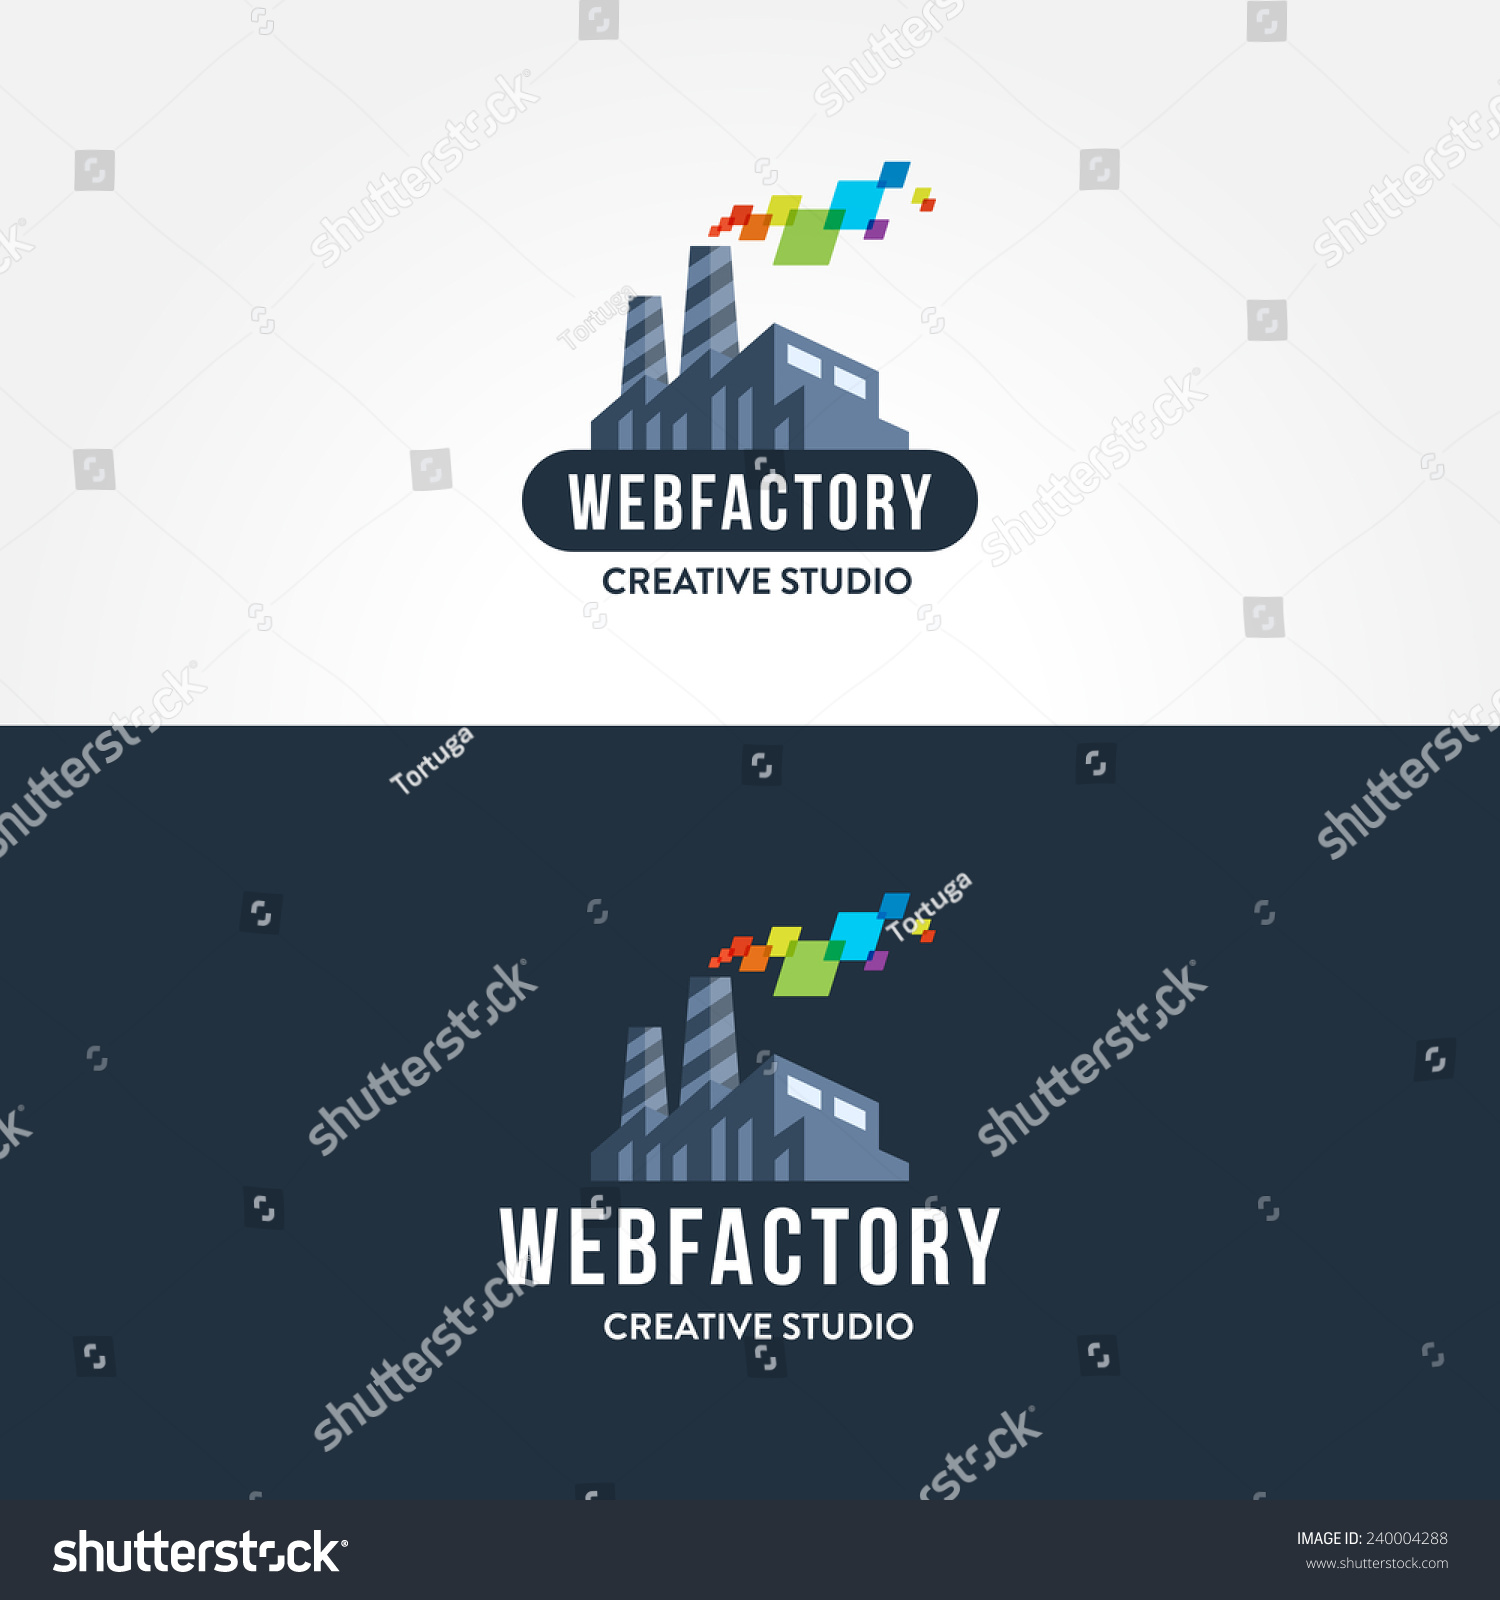 VectorelStudio - Graphic Design Factory Logo photo - 1